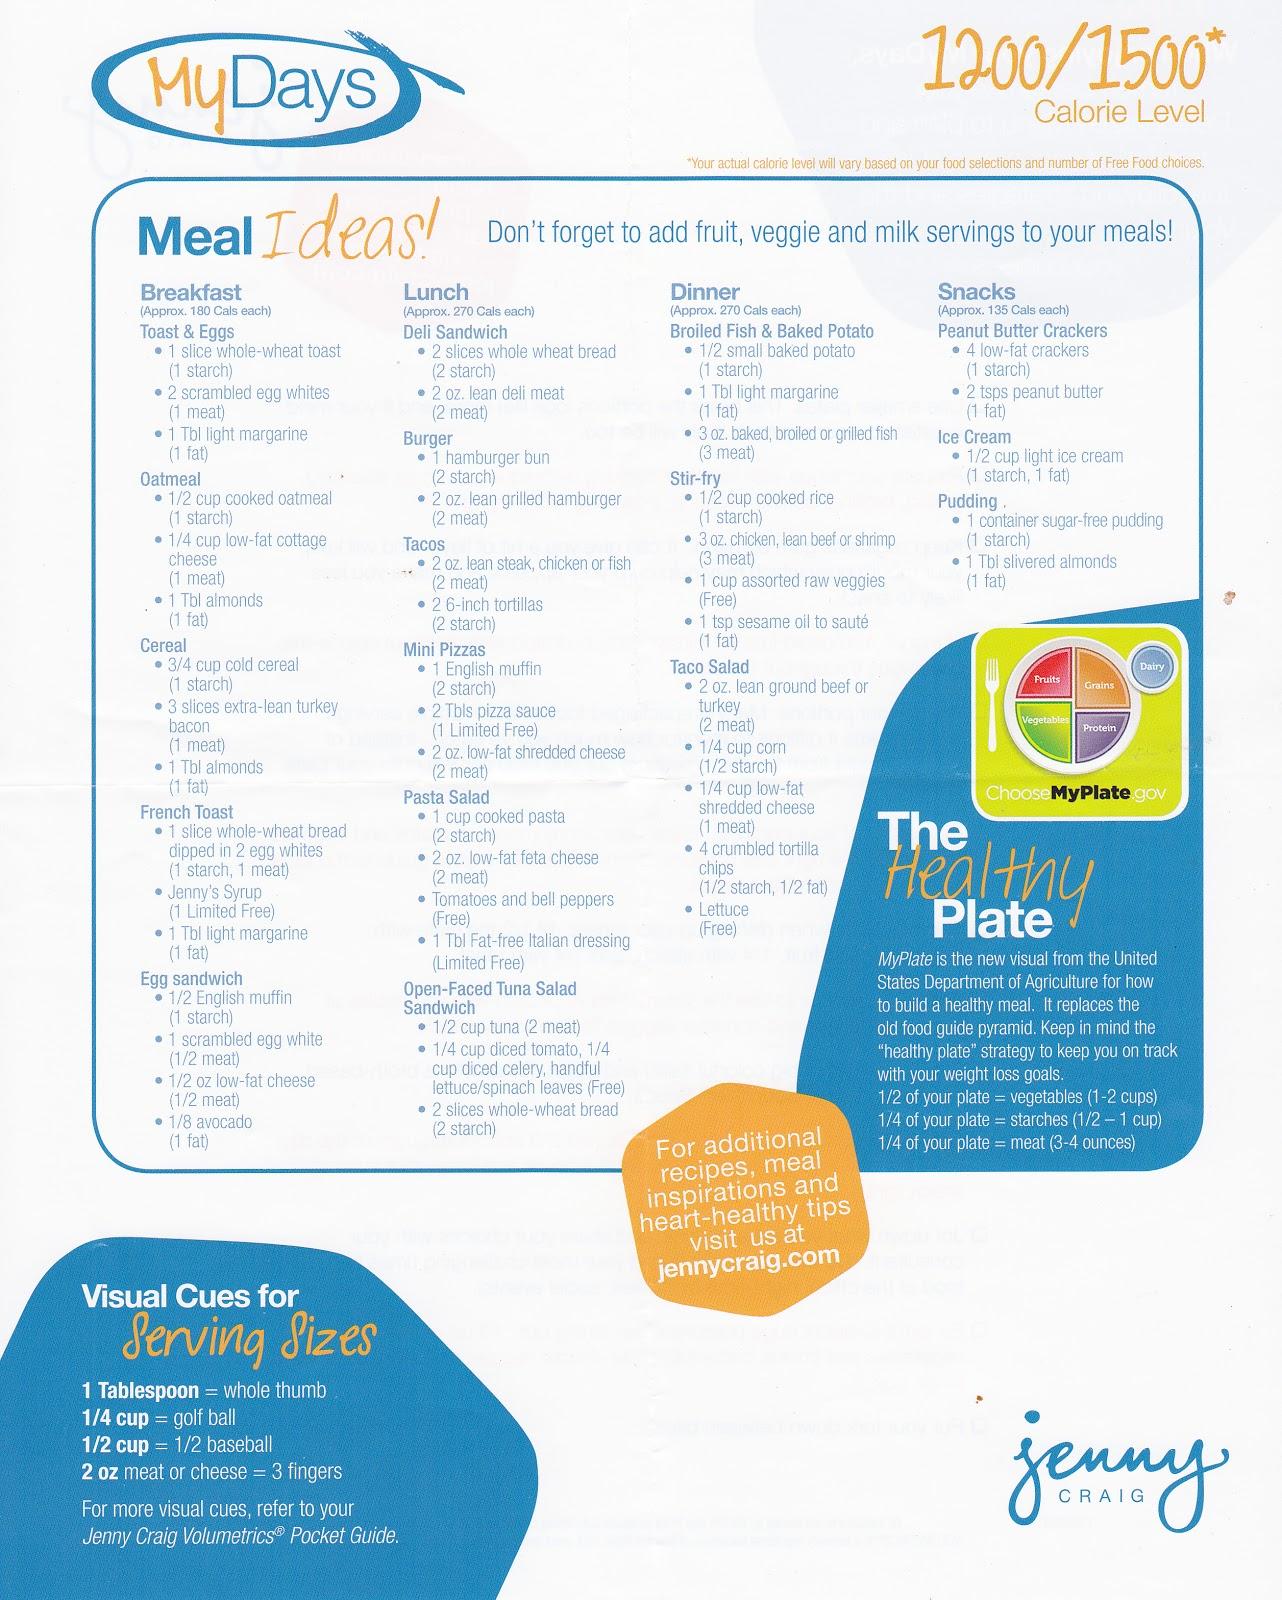 Nutrisystem diet and salt content